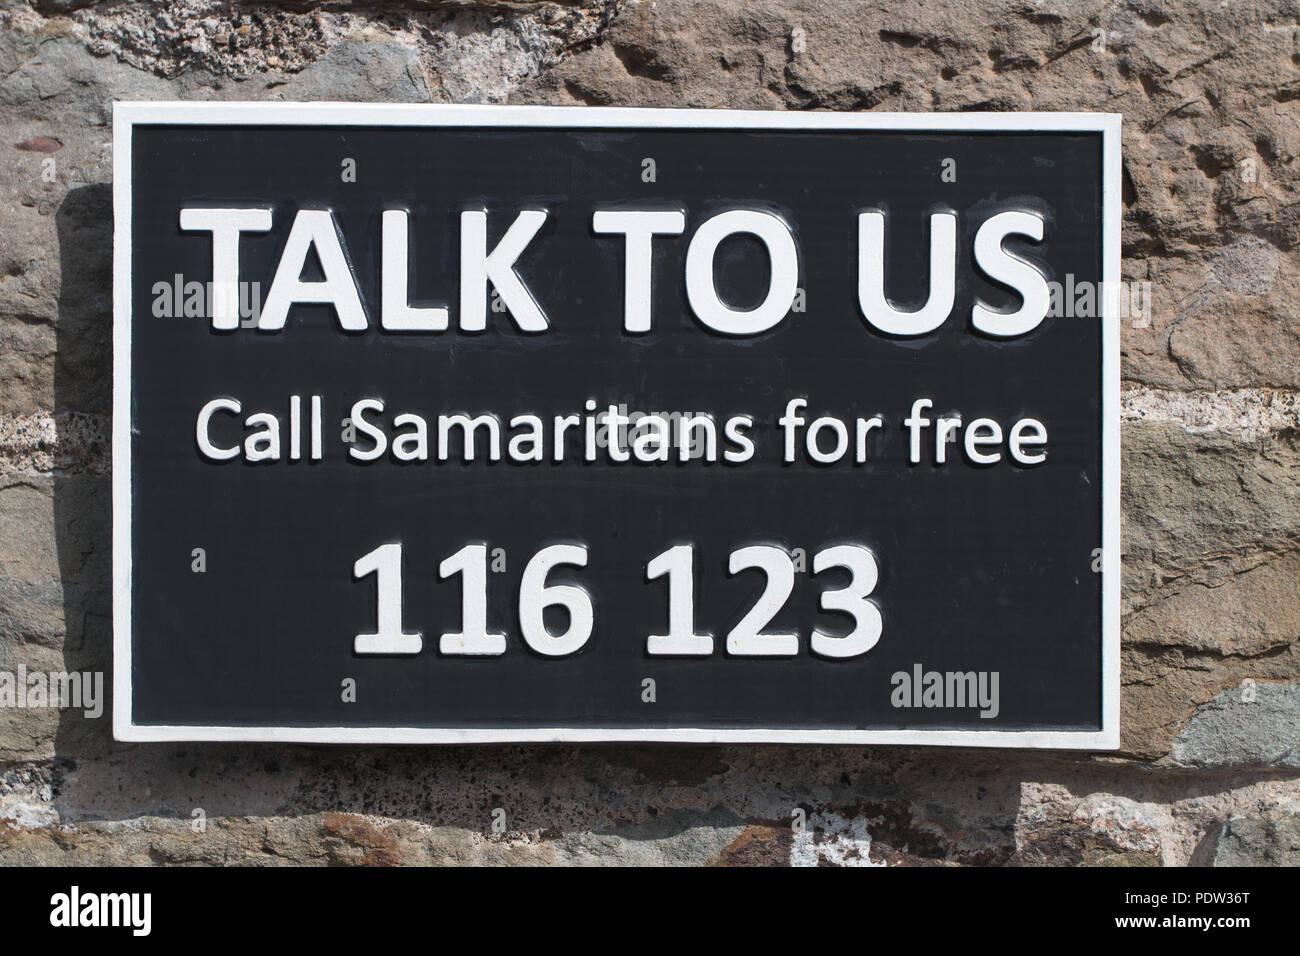 SAMARITANS: Talk To Us - A Sign on Clifton Suspension Bridge Stock Photo